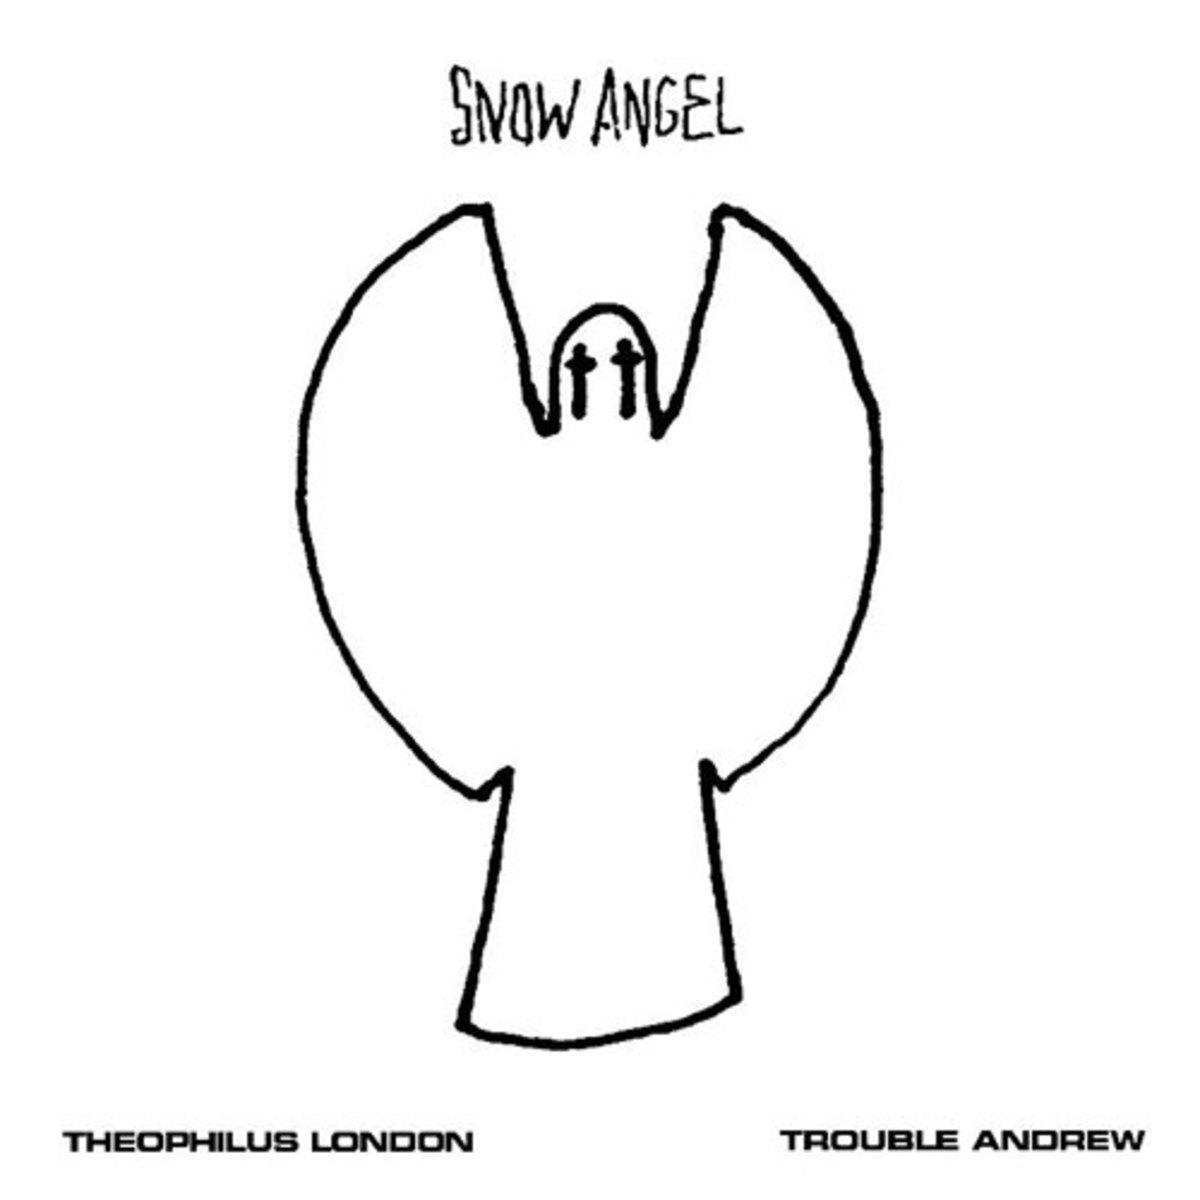 theolondon-snowangel.jpg